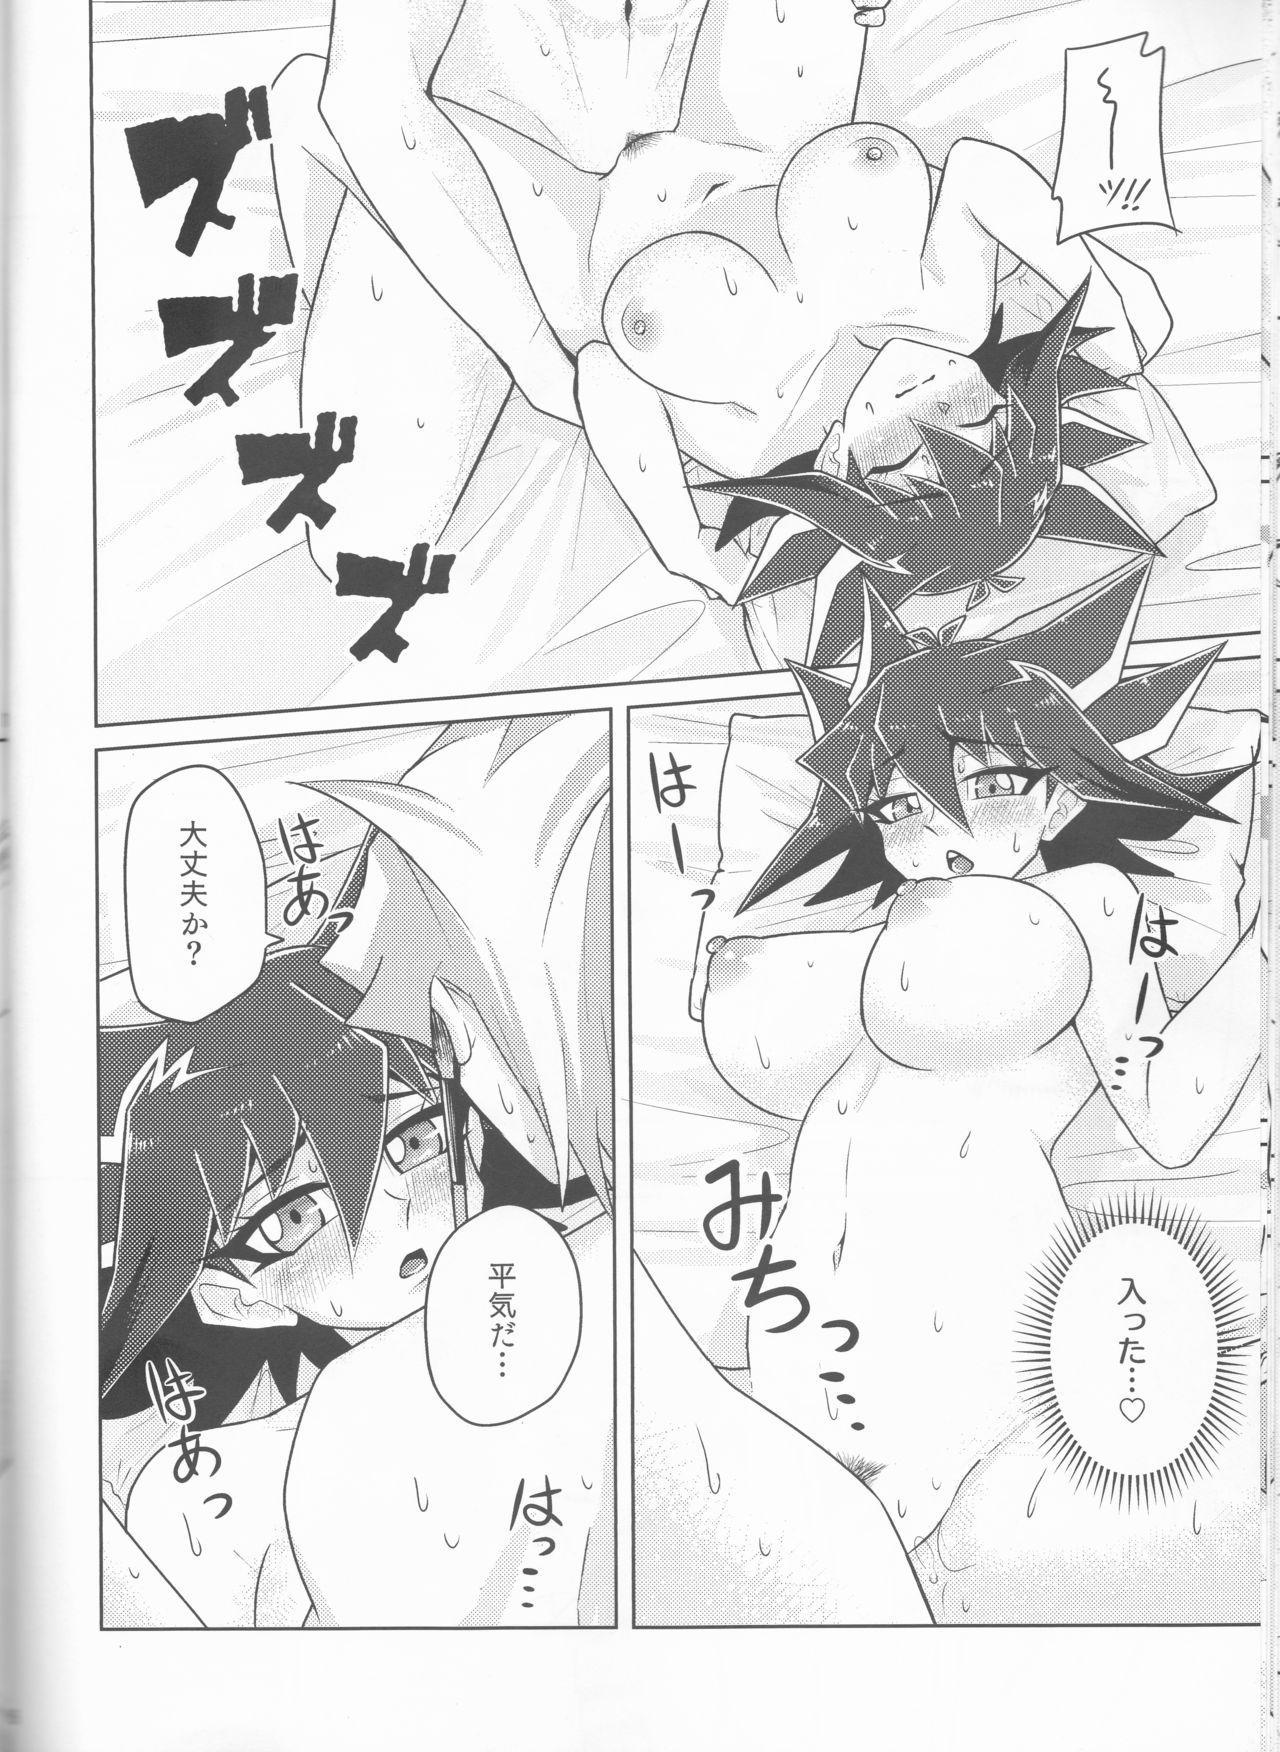 (Chou Ore no Turn 2019) [KINOPOTION (Take Nameko)] King (Mi) to Yusei-chan ♀ (Yu-Gi-Oh! 5D's) 15